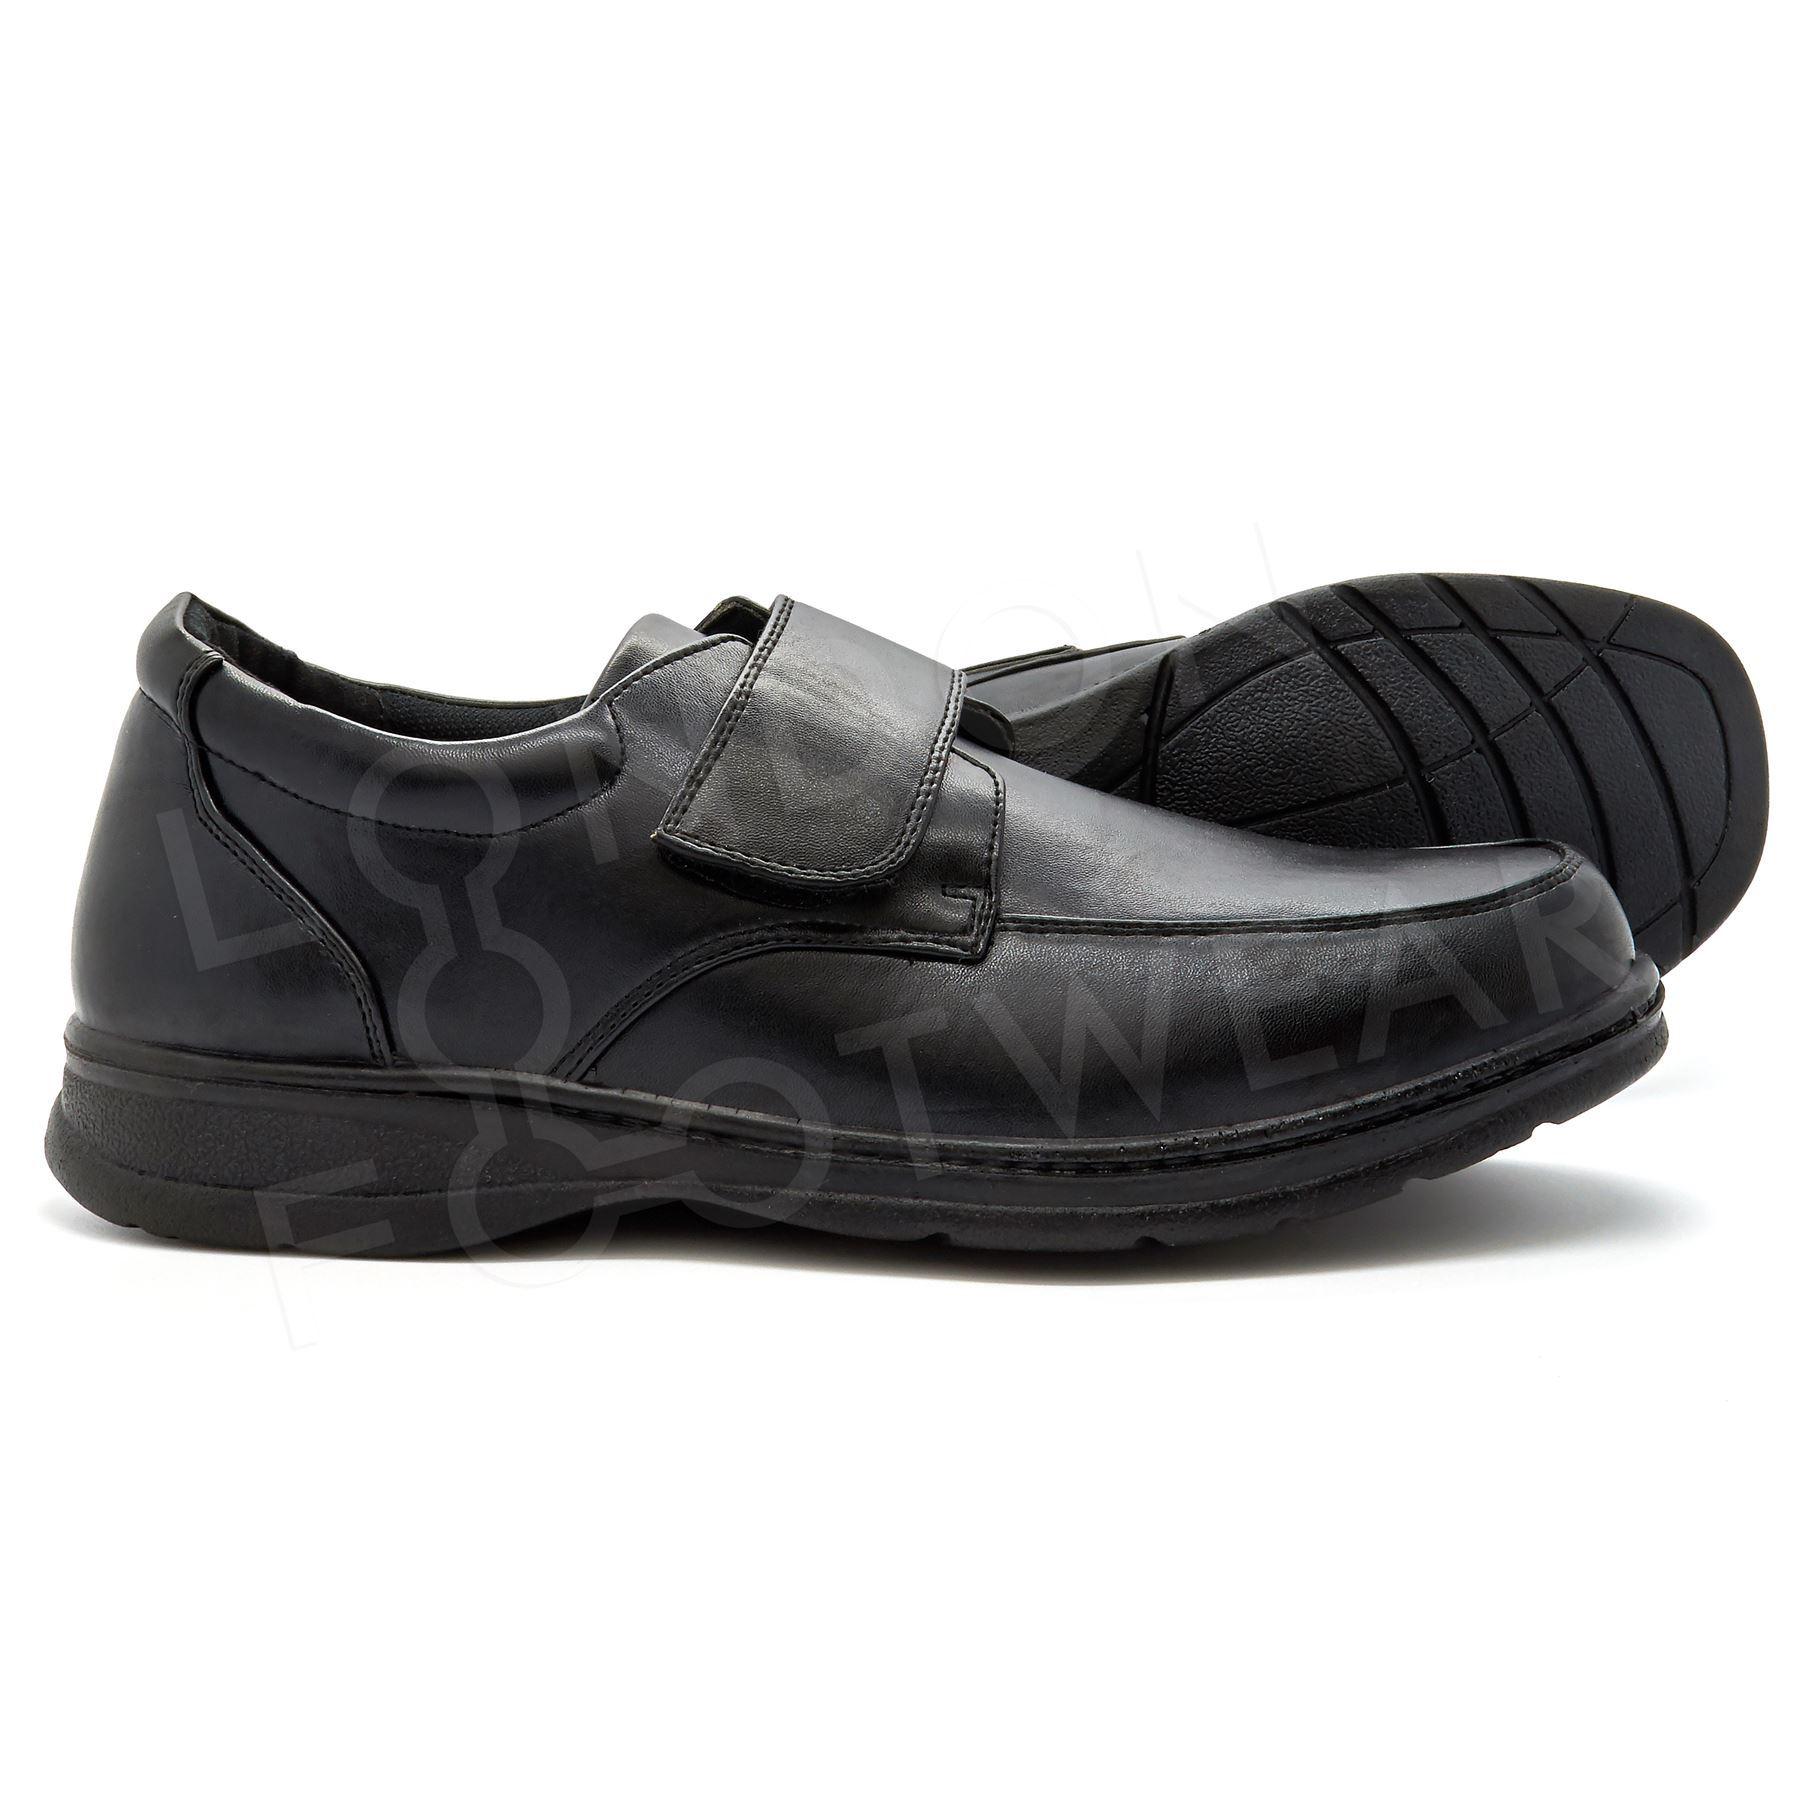 new mens smart comfort office wedding shoes dress work